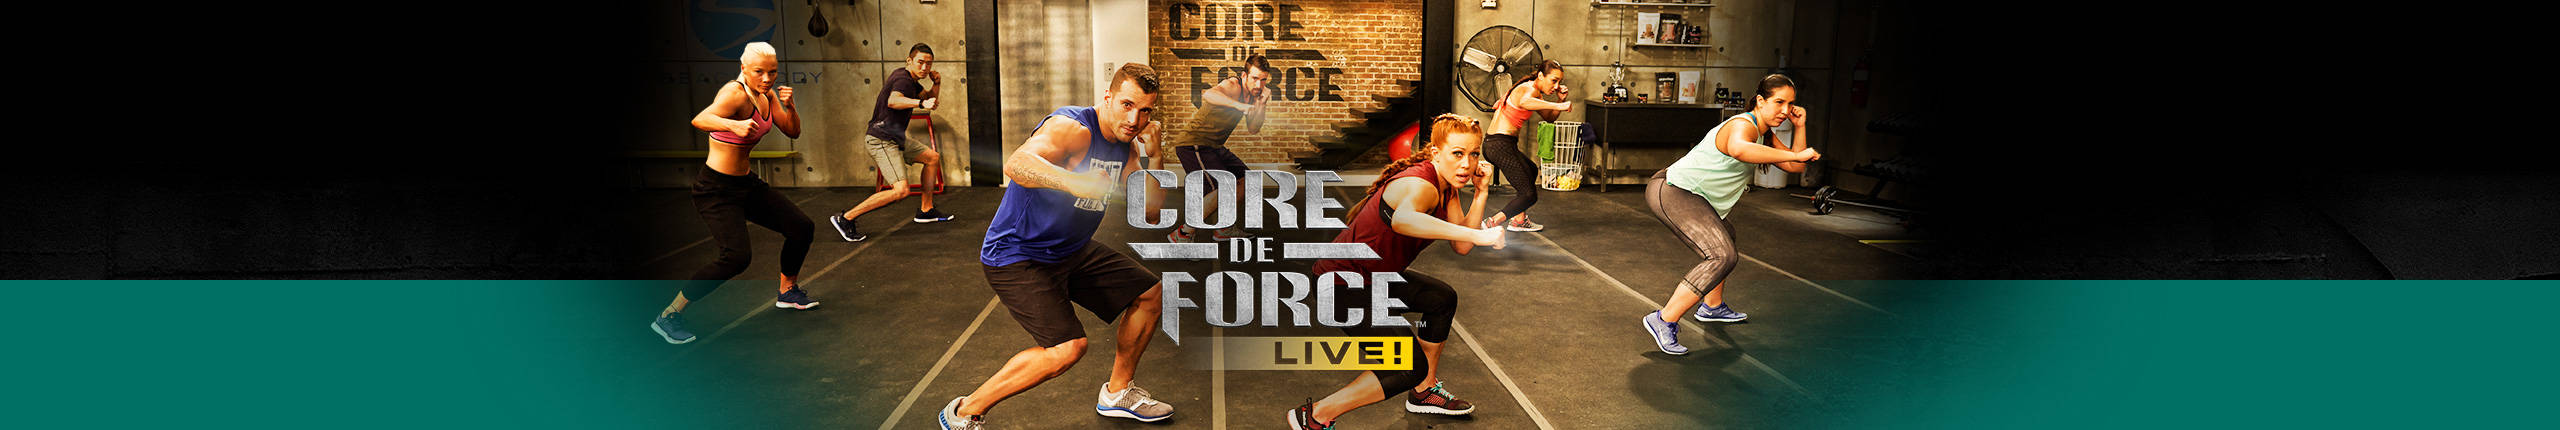 CDF_LIVE_EMC-Hero_2560